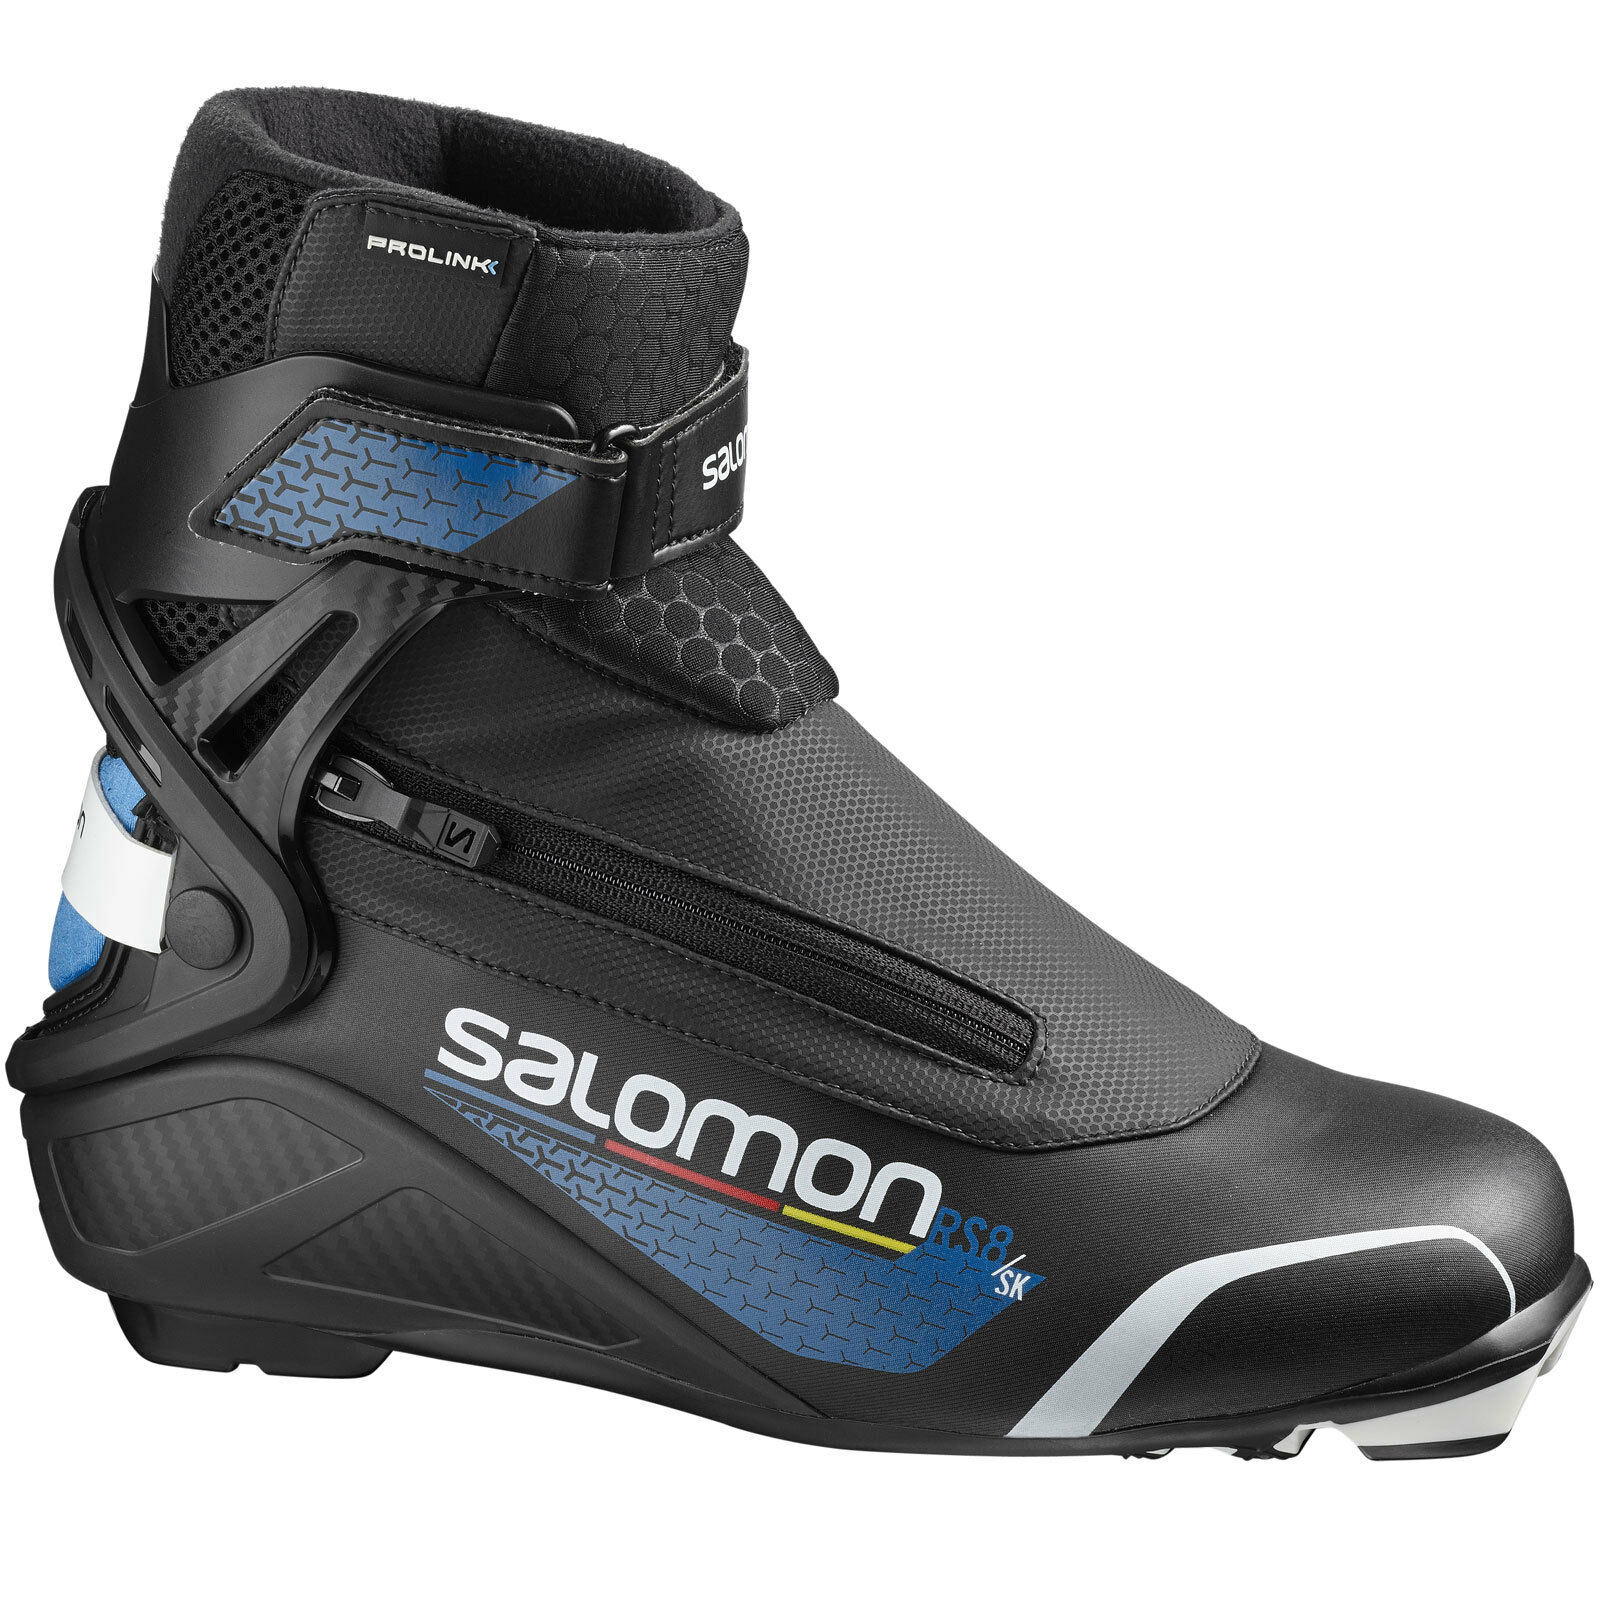 Salomon RS8 Prolink Damen   Herren Langlaufschuhe Langlaufschuhe Langlaufschuhe Langlauf-Schuhe Langläufer 6f31af